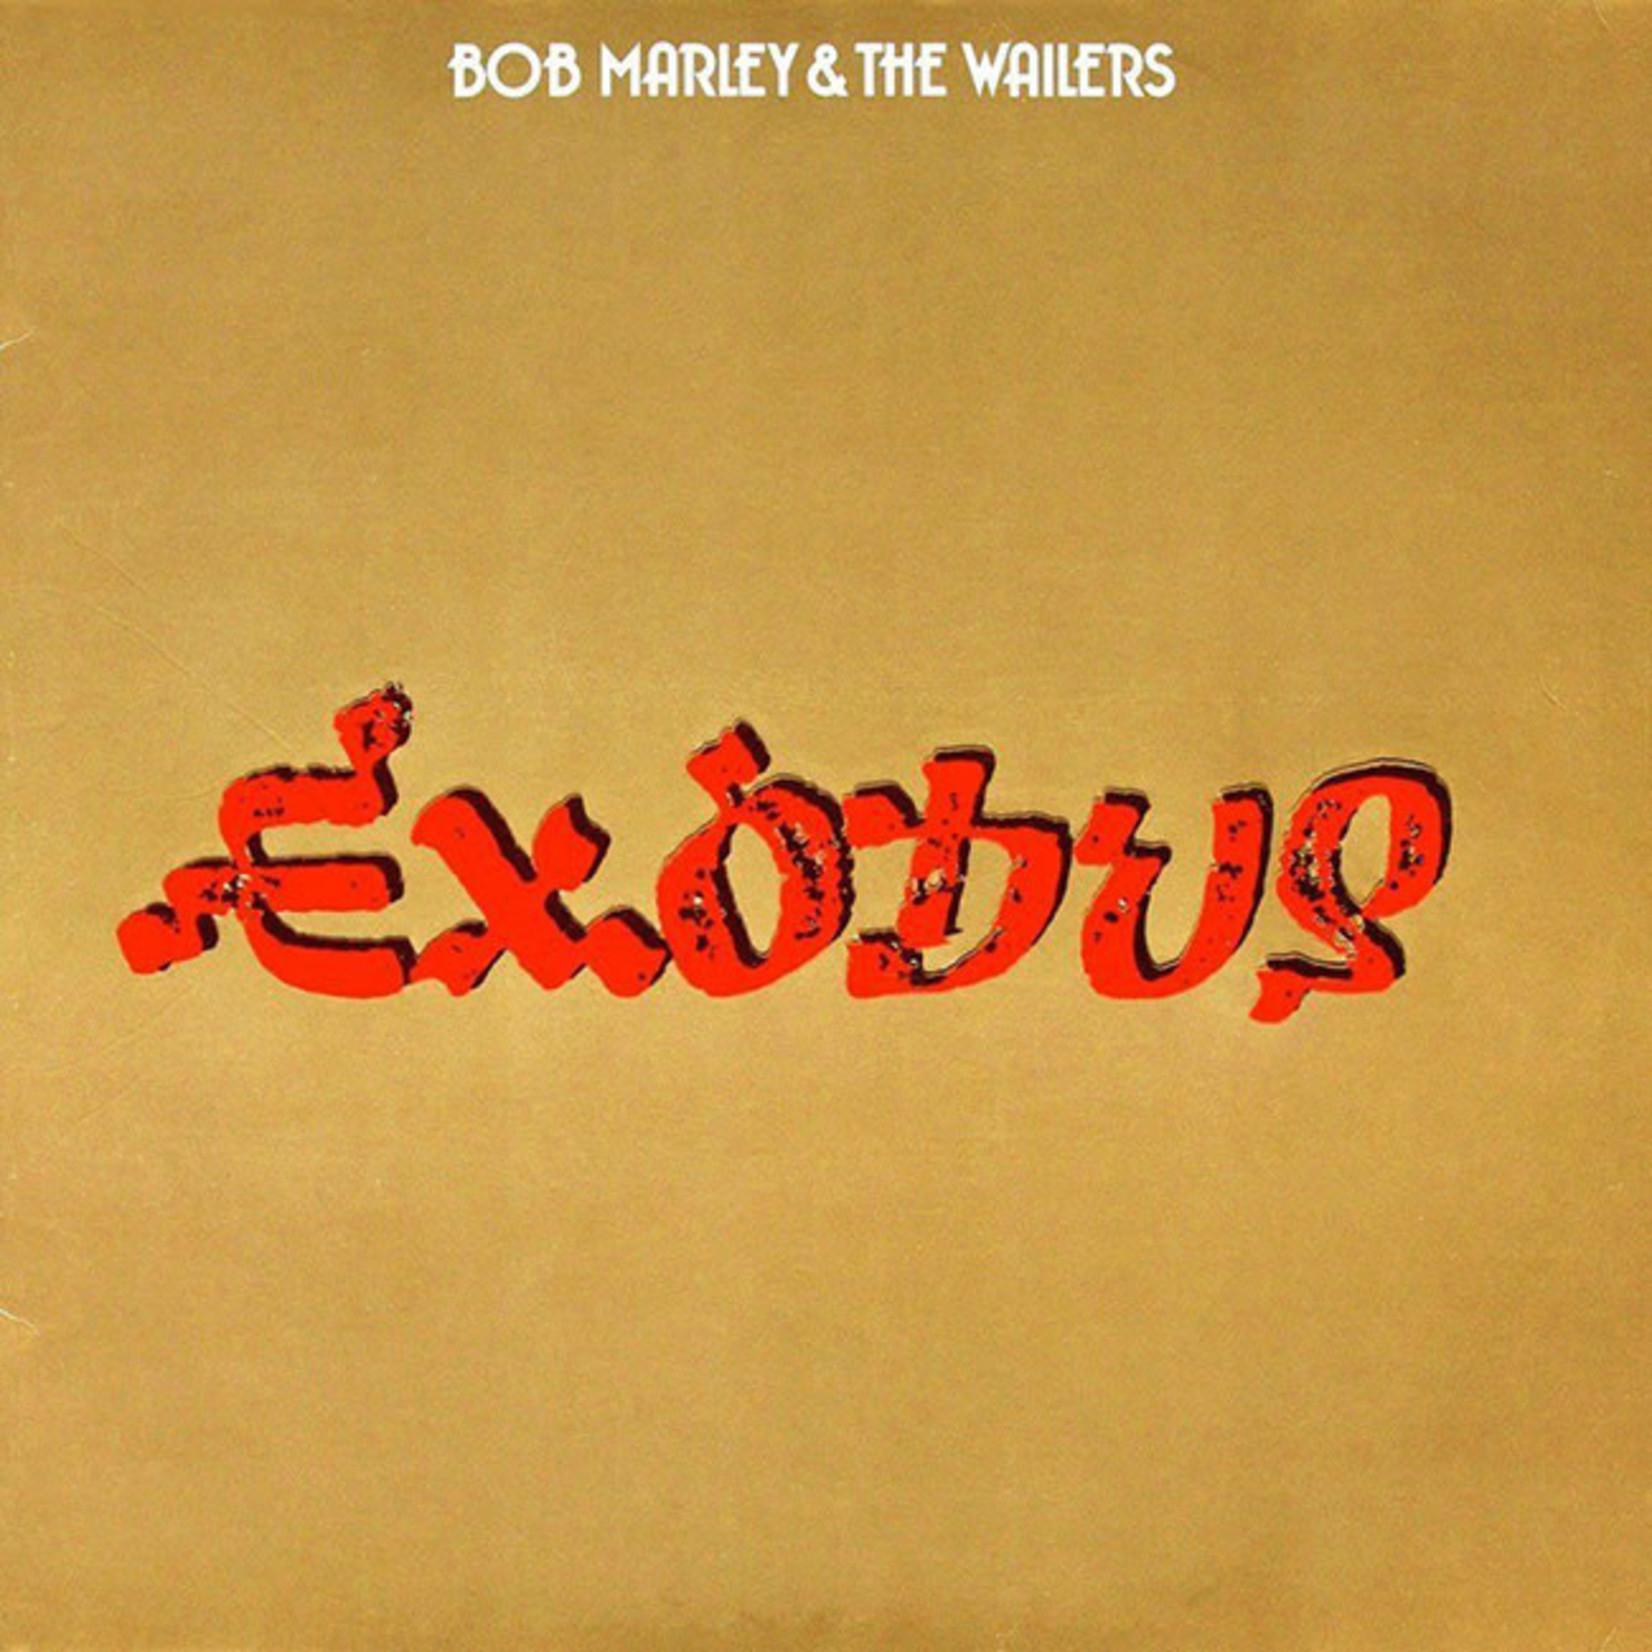 [New] Marley, Bob: Exodus